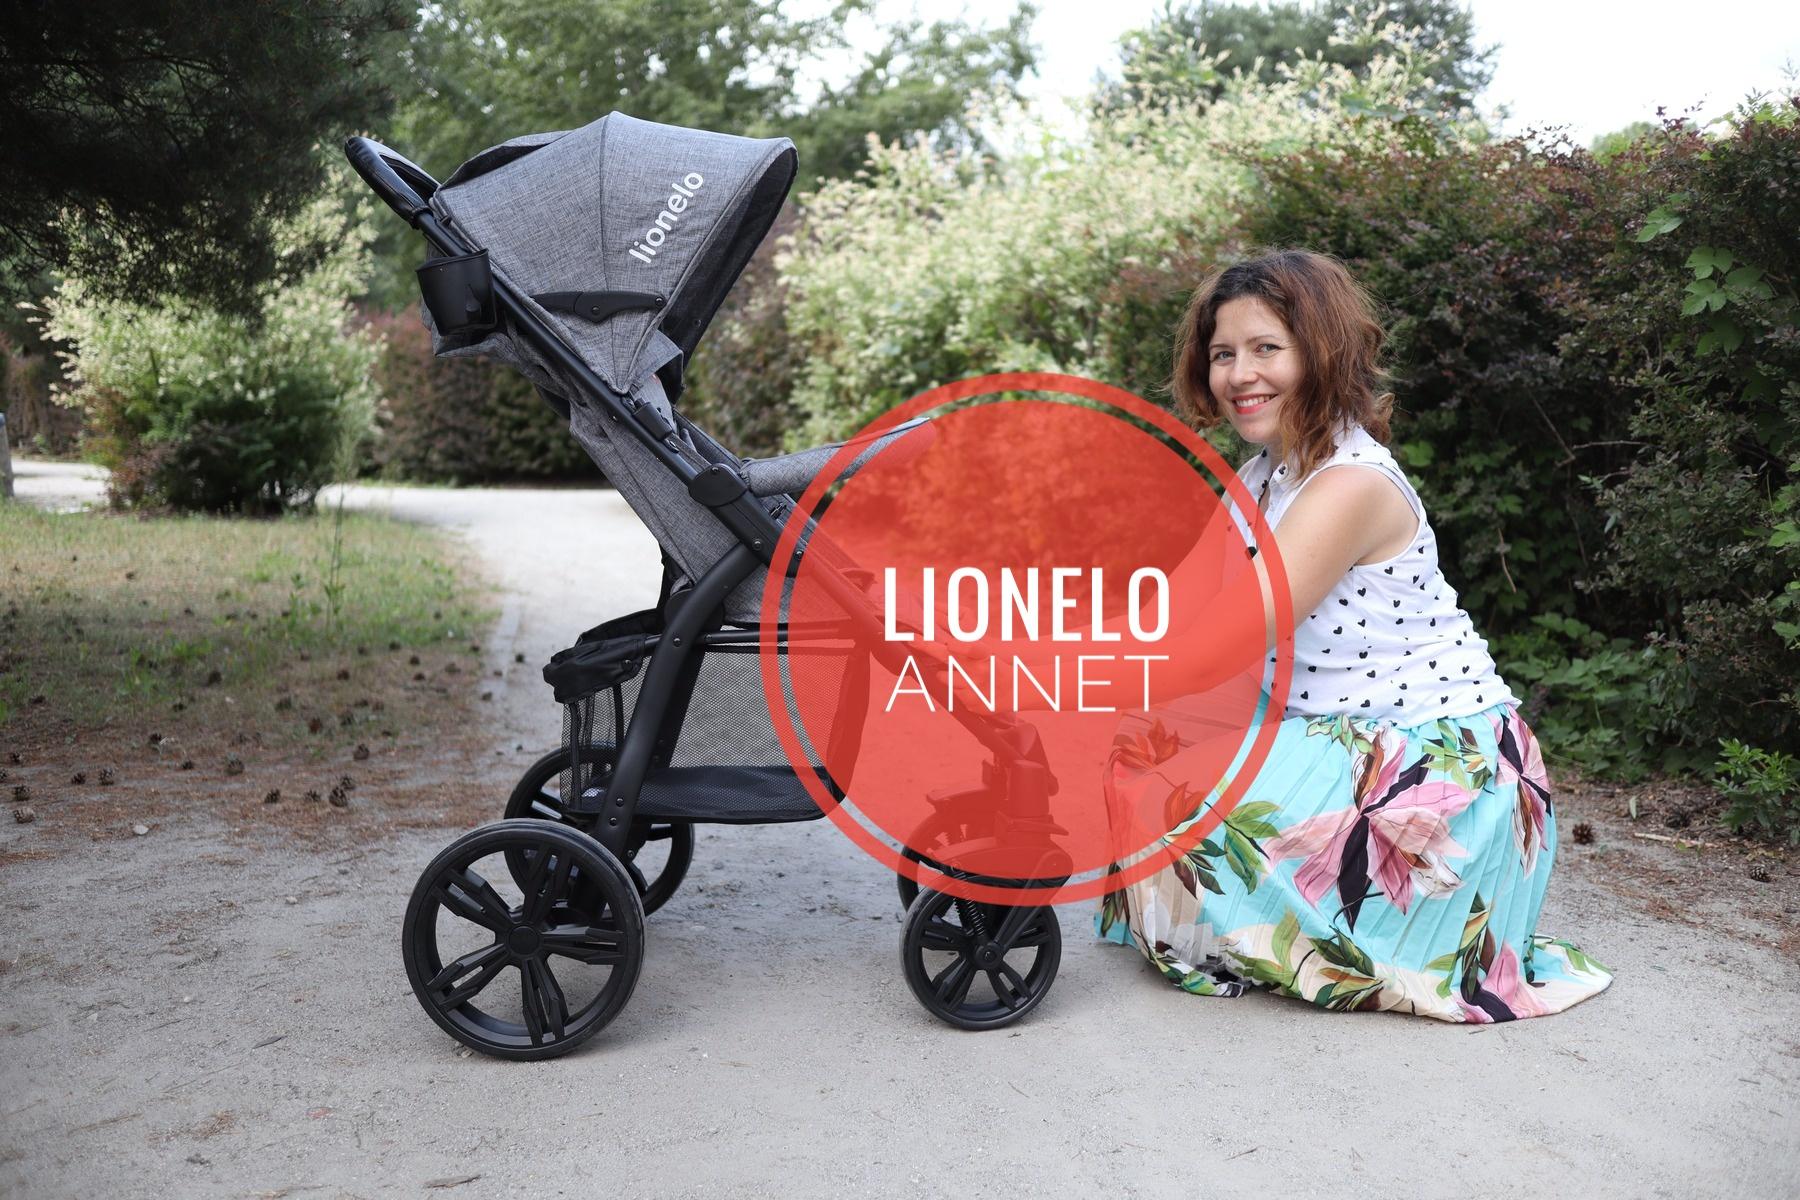 Lionelo Annet